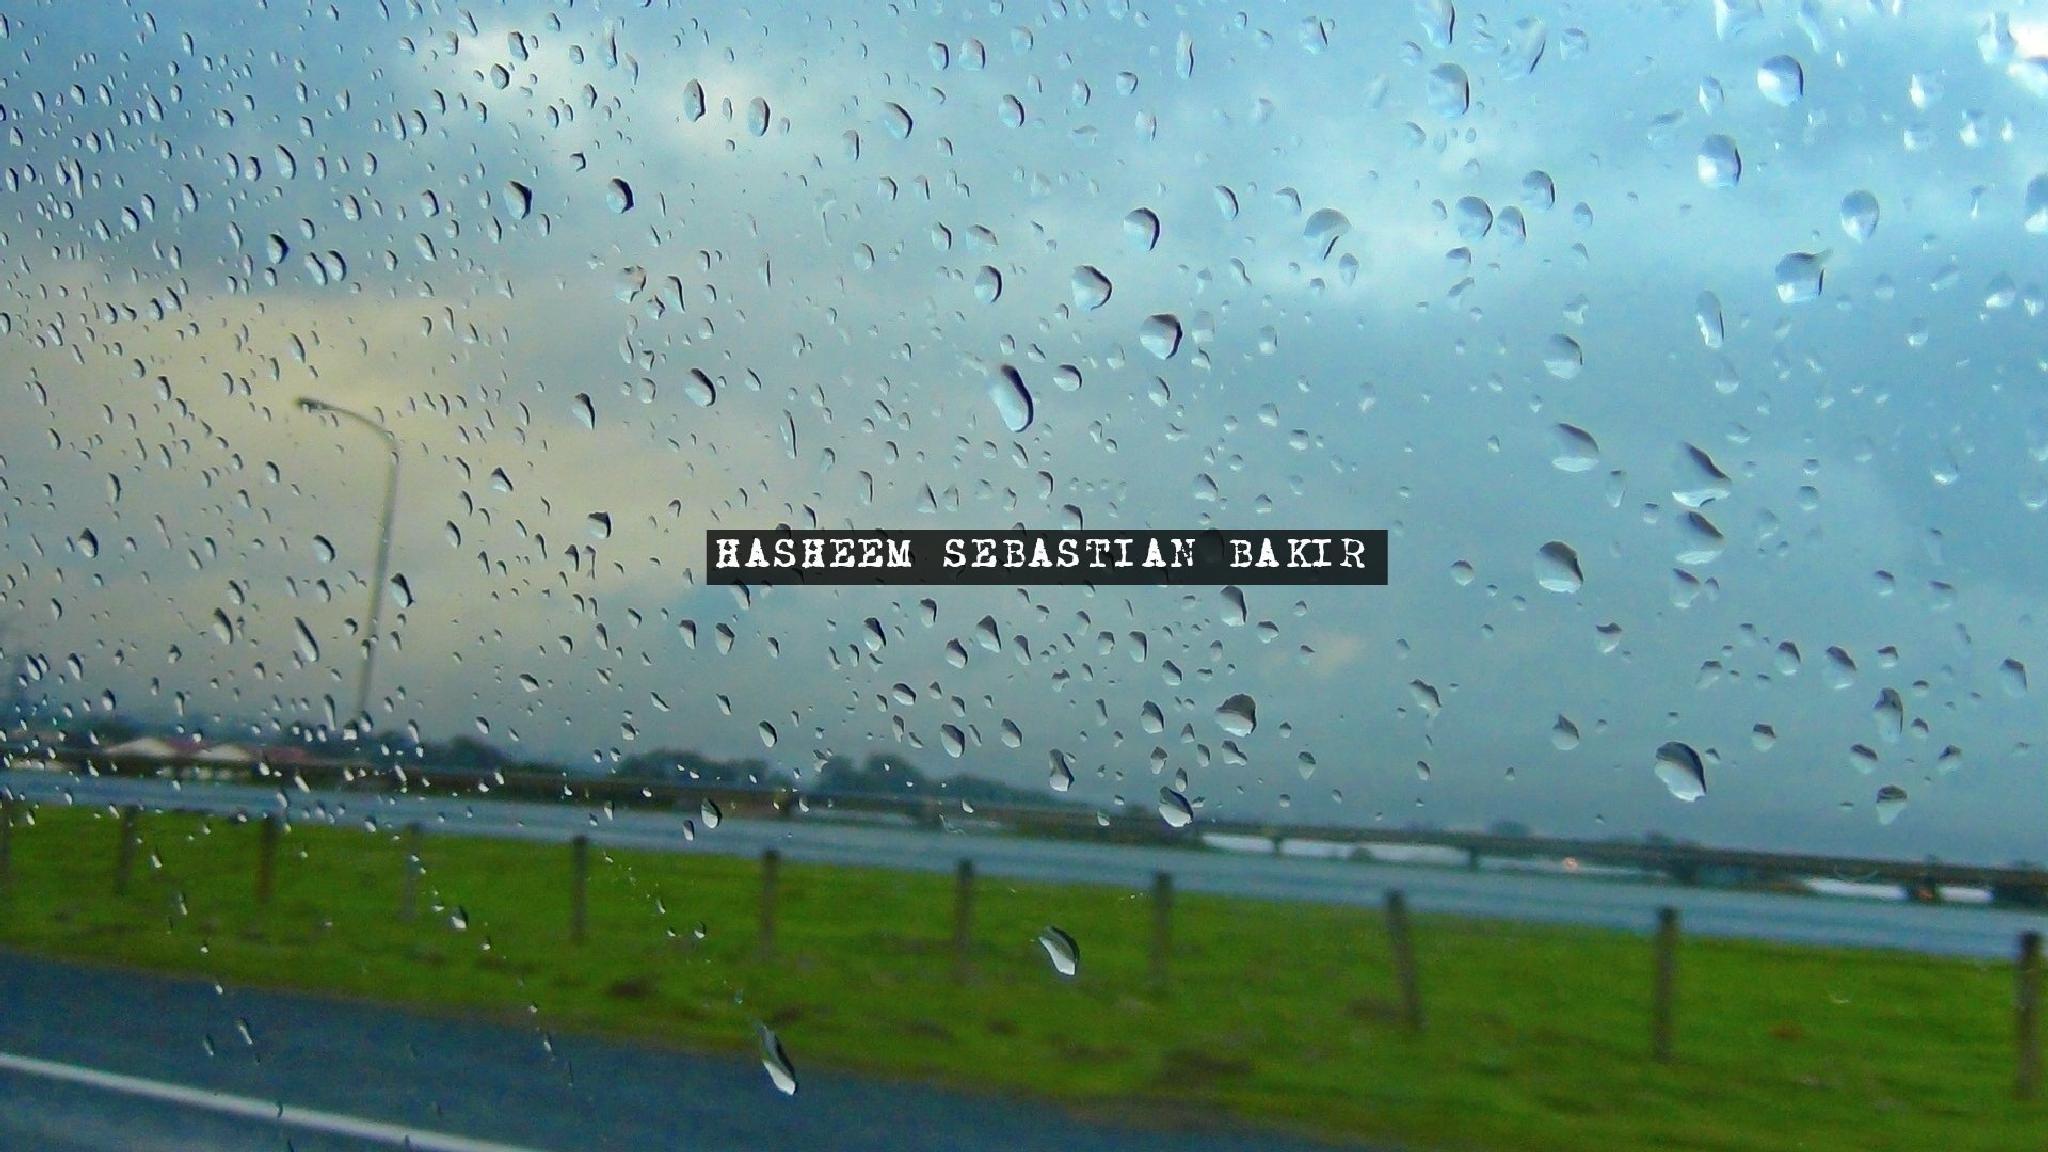 Raindrops Keep Falling on My Head by Hasheem Sebastian Bakir